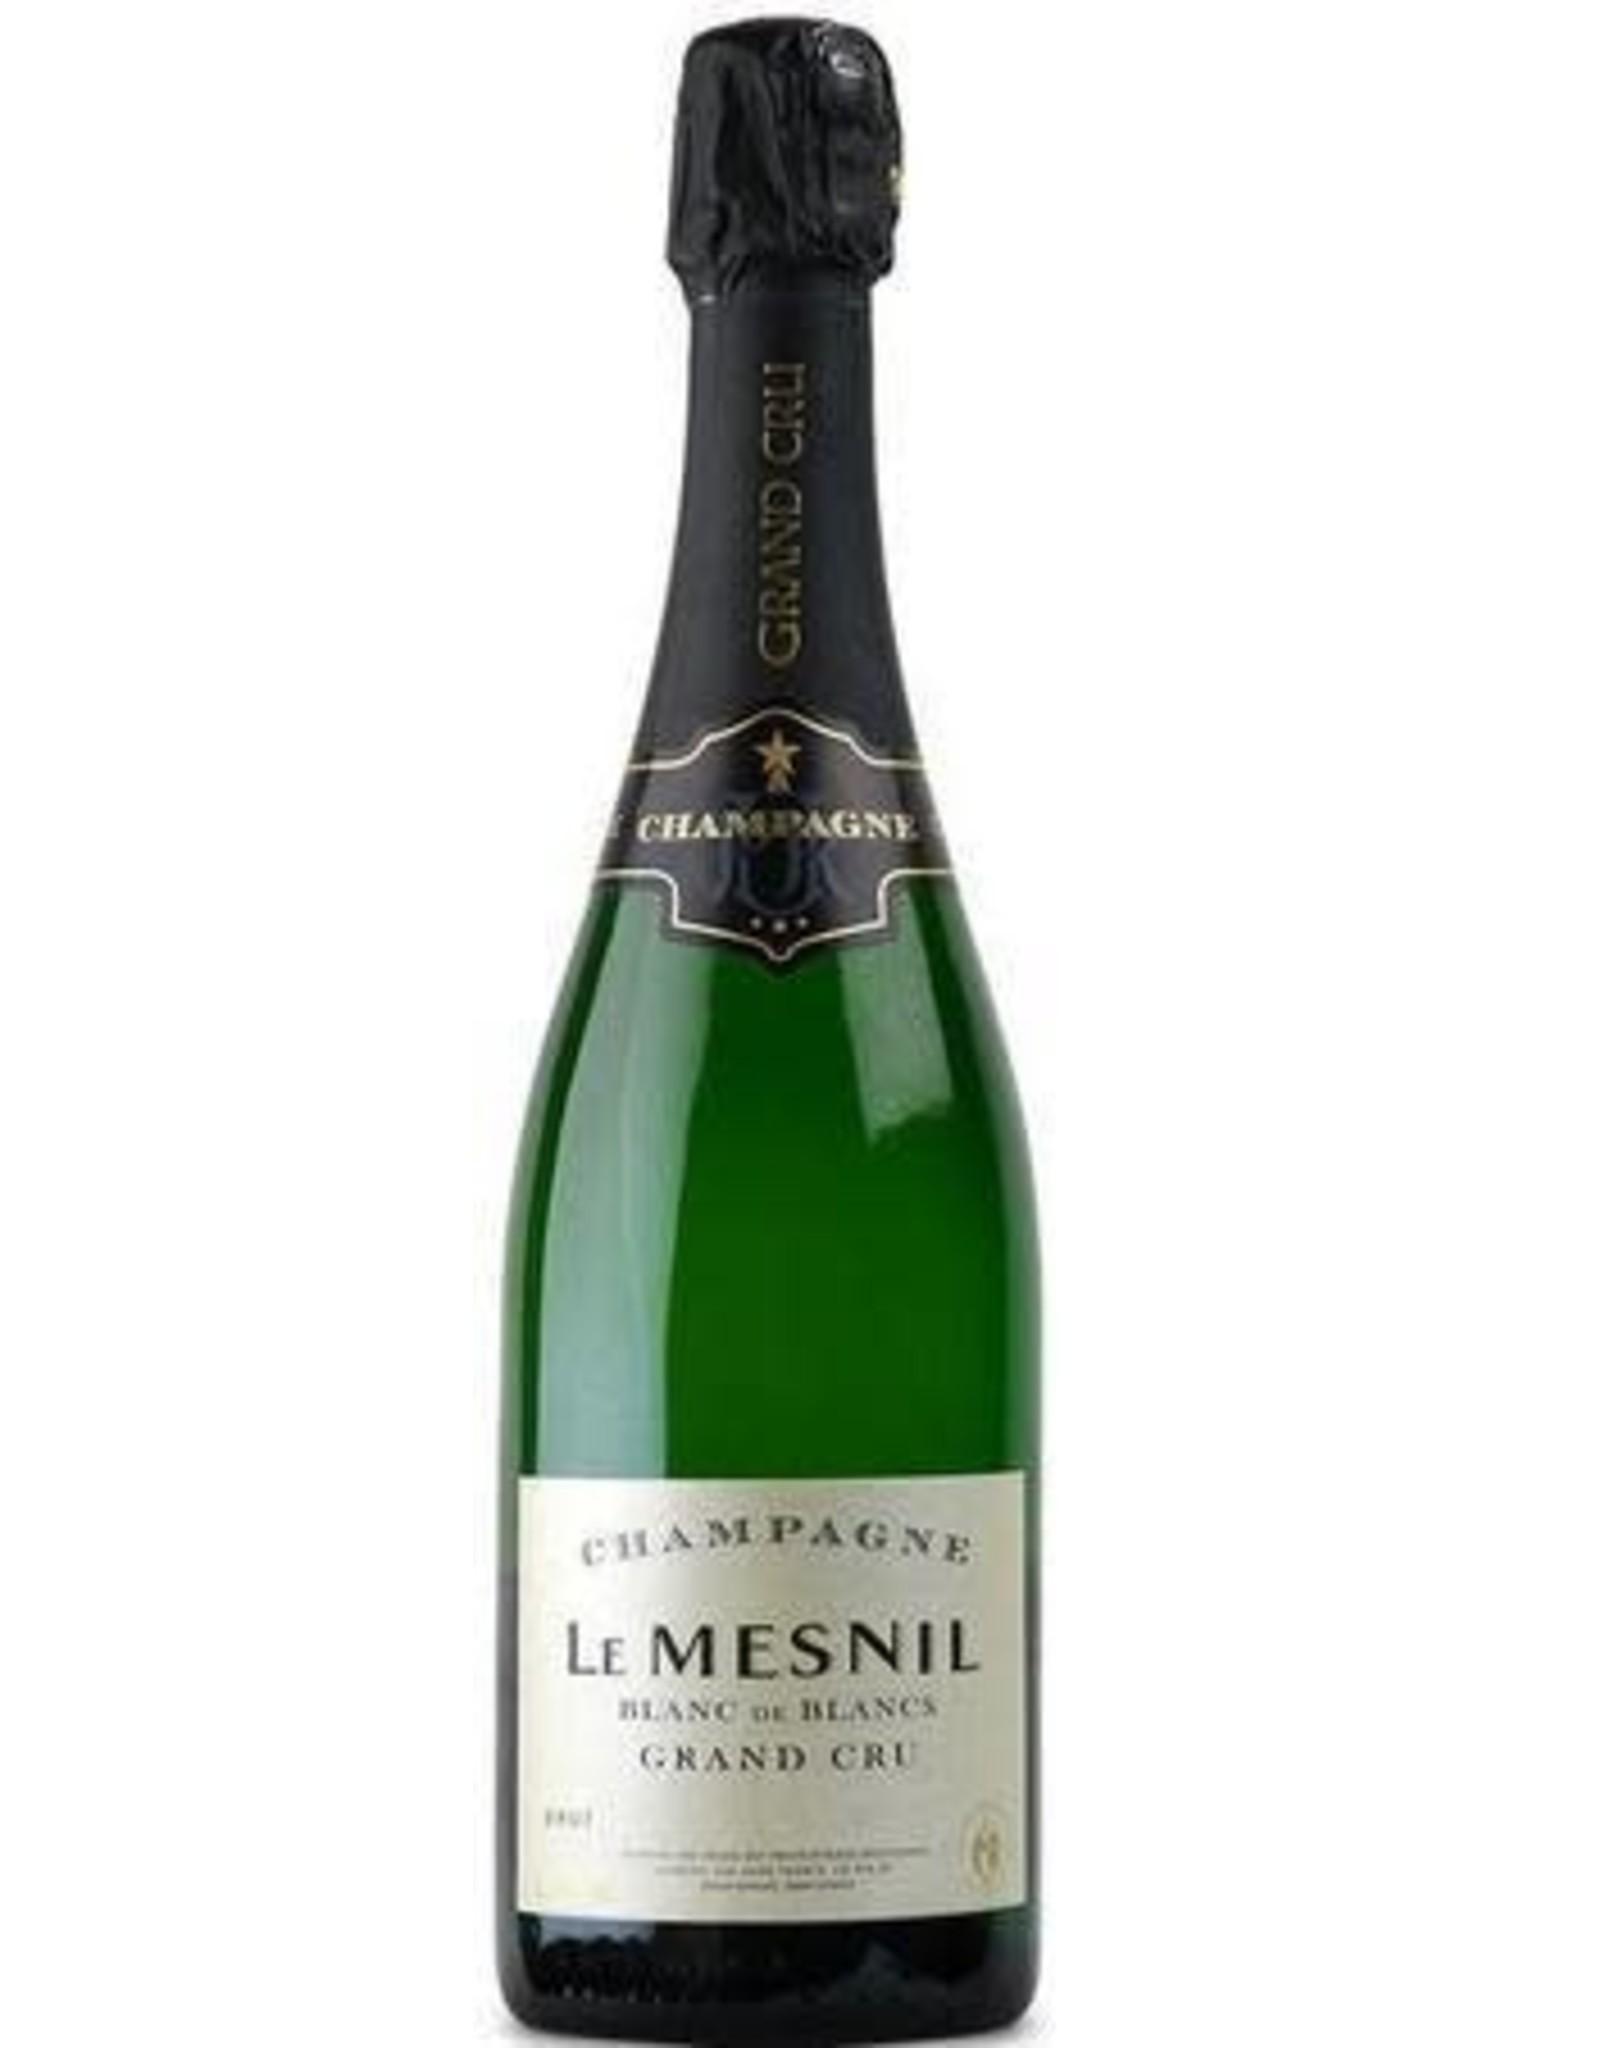 Le Mesnil Champagne Les Mesnil Champagne Grand Cru Blanc de Blancs (NV) 375ml